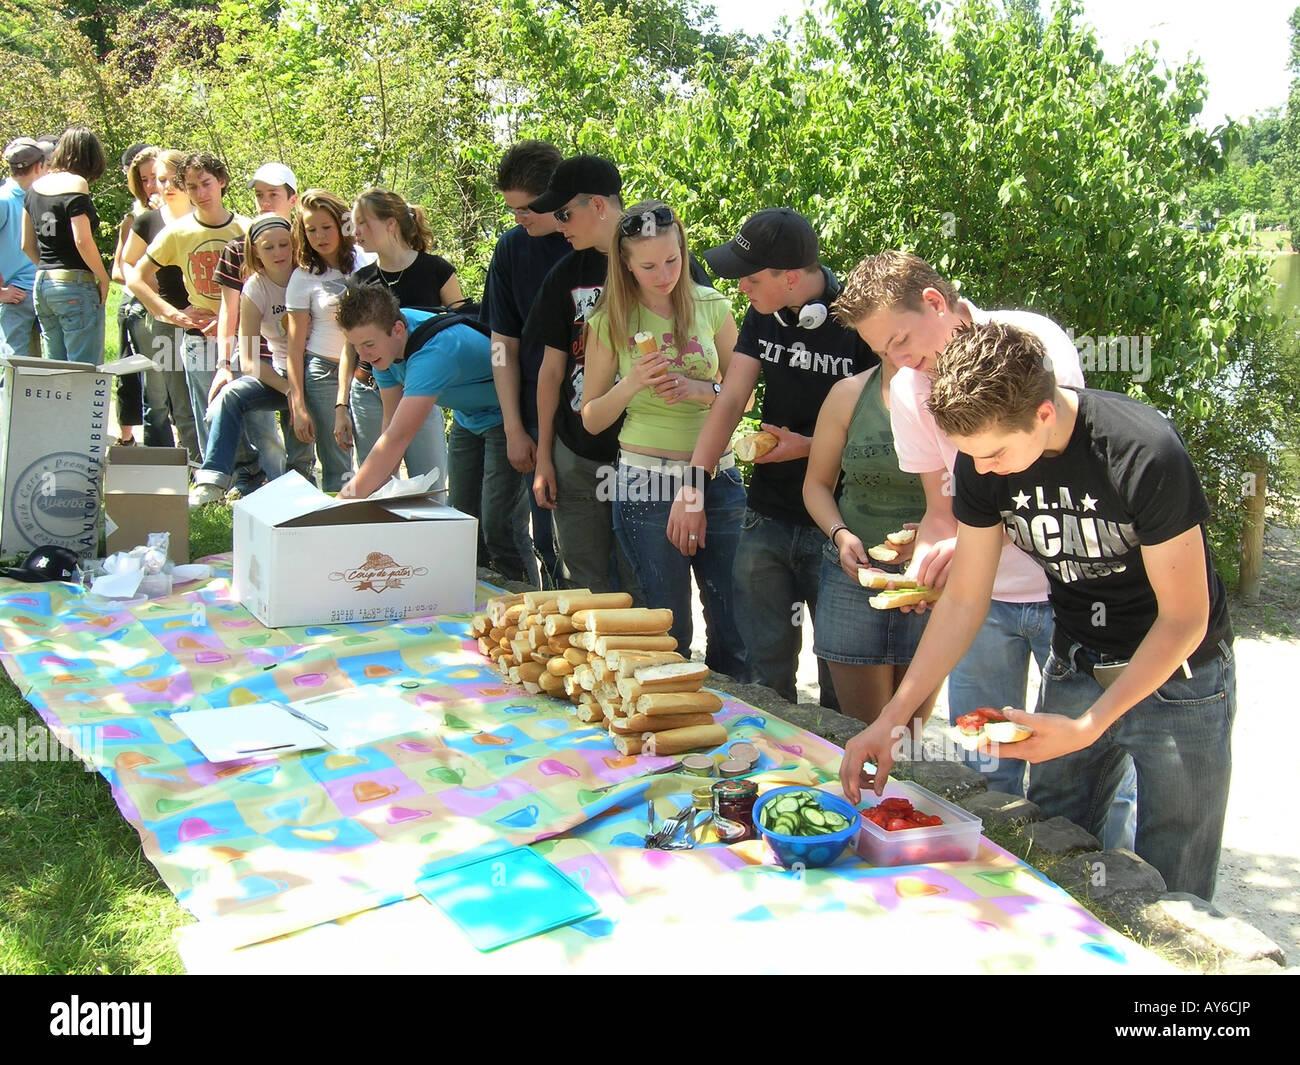 Group of schoolchildren enjoying picnic in Bois de Boulogne Paris France - Stock Image